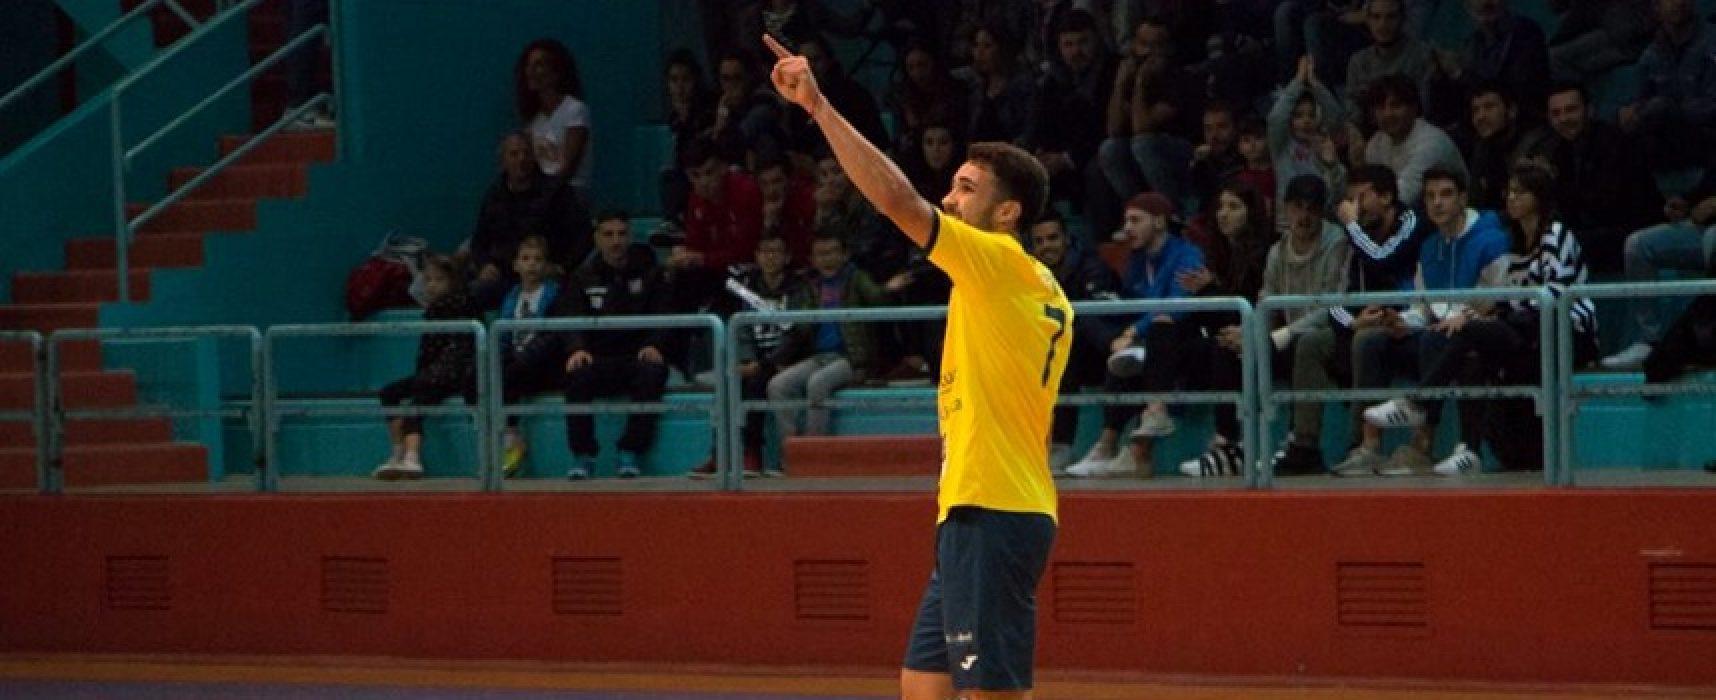 Salinis – Futsal Bisceglie 3-6 / HIGHLIGHTS VIDEO